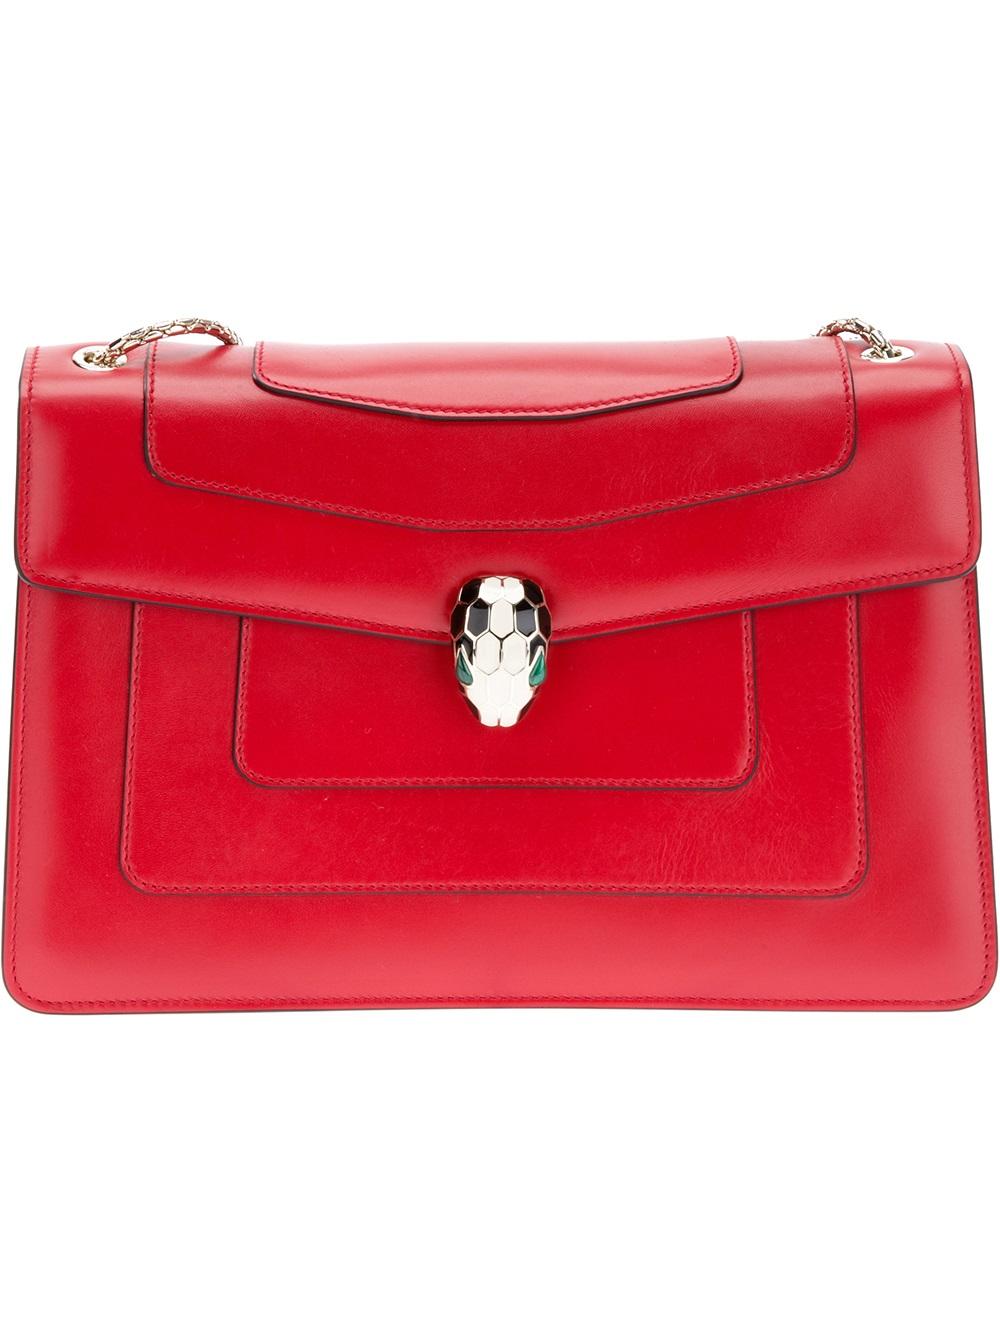 ebbb0cd98066 Lyst - BVLGARI Serpenti Leather Shoulder Bag in Red